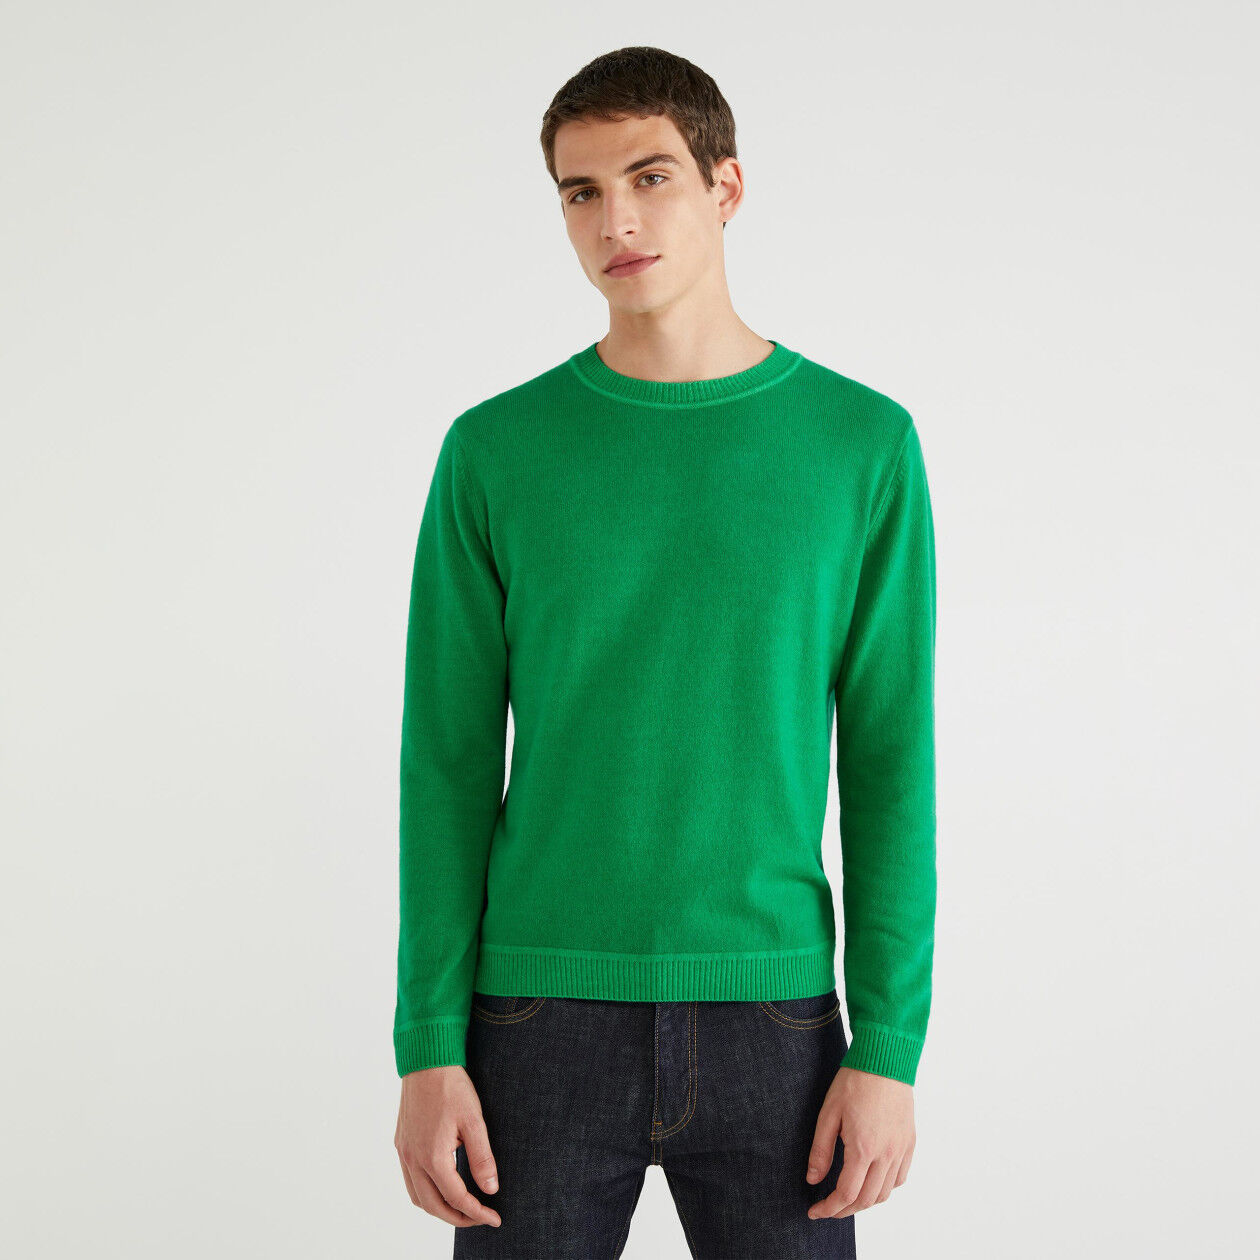 Camisola de gola redonda em lã